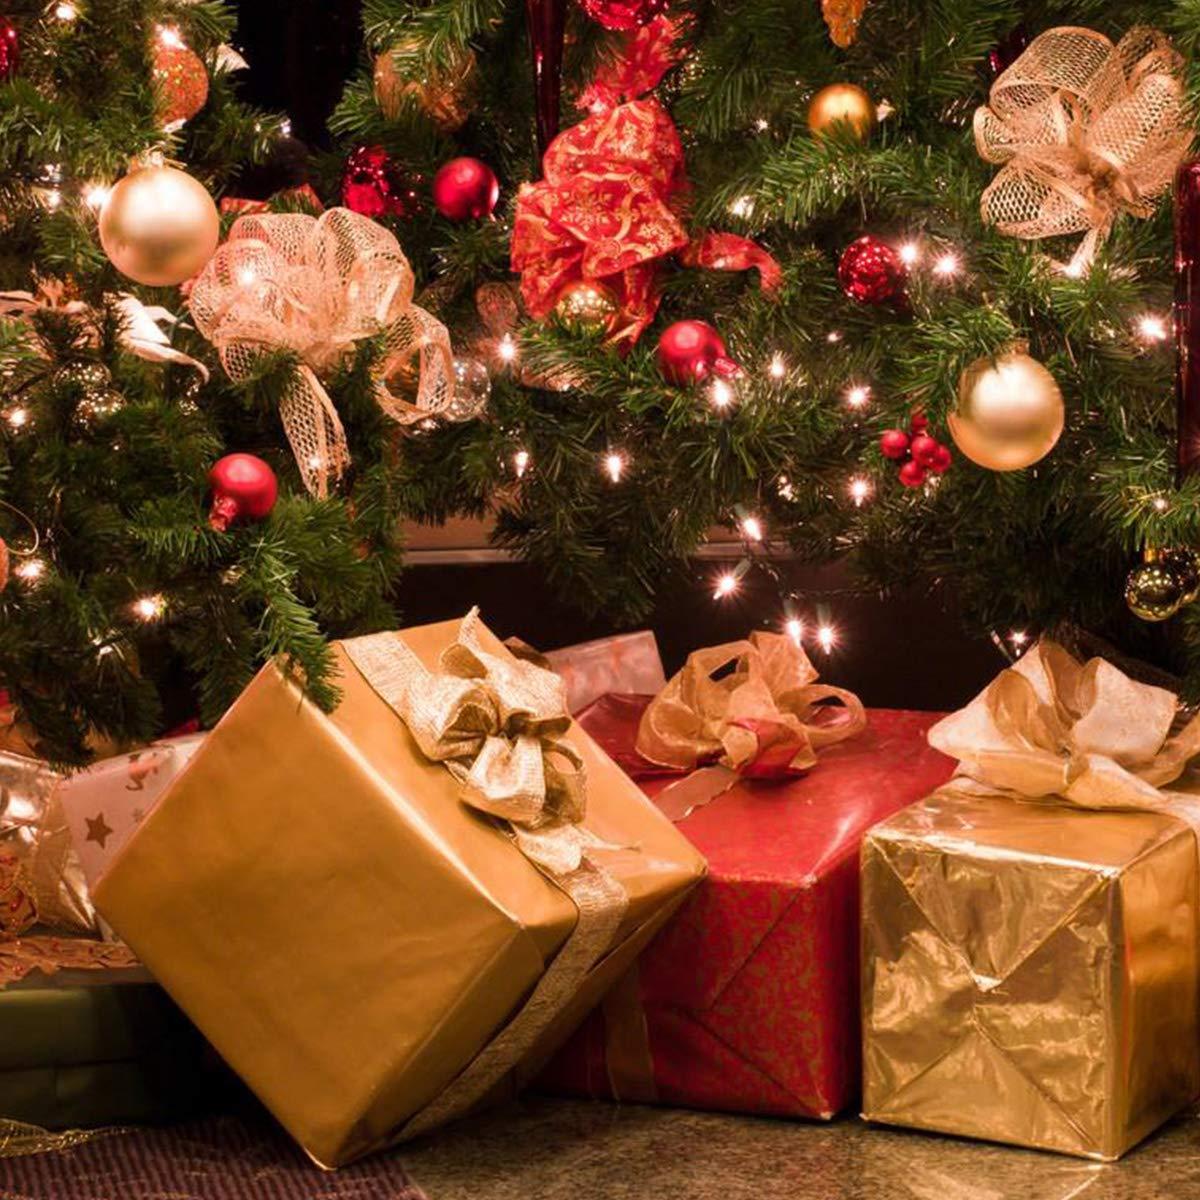 Aitsite Weihnachtskugeln 4 cm Weihnachtsbaum Kugeln Christbaumkugeln Flitter